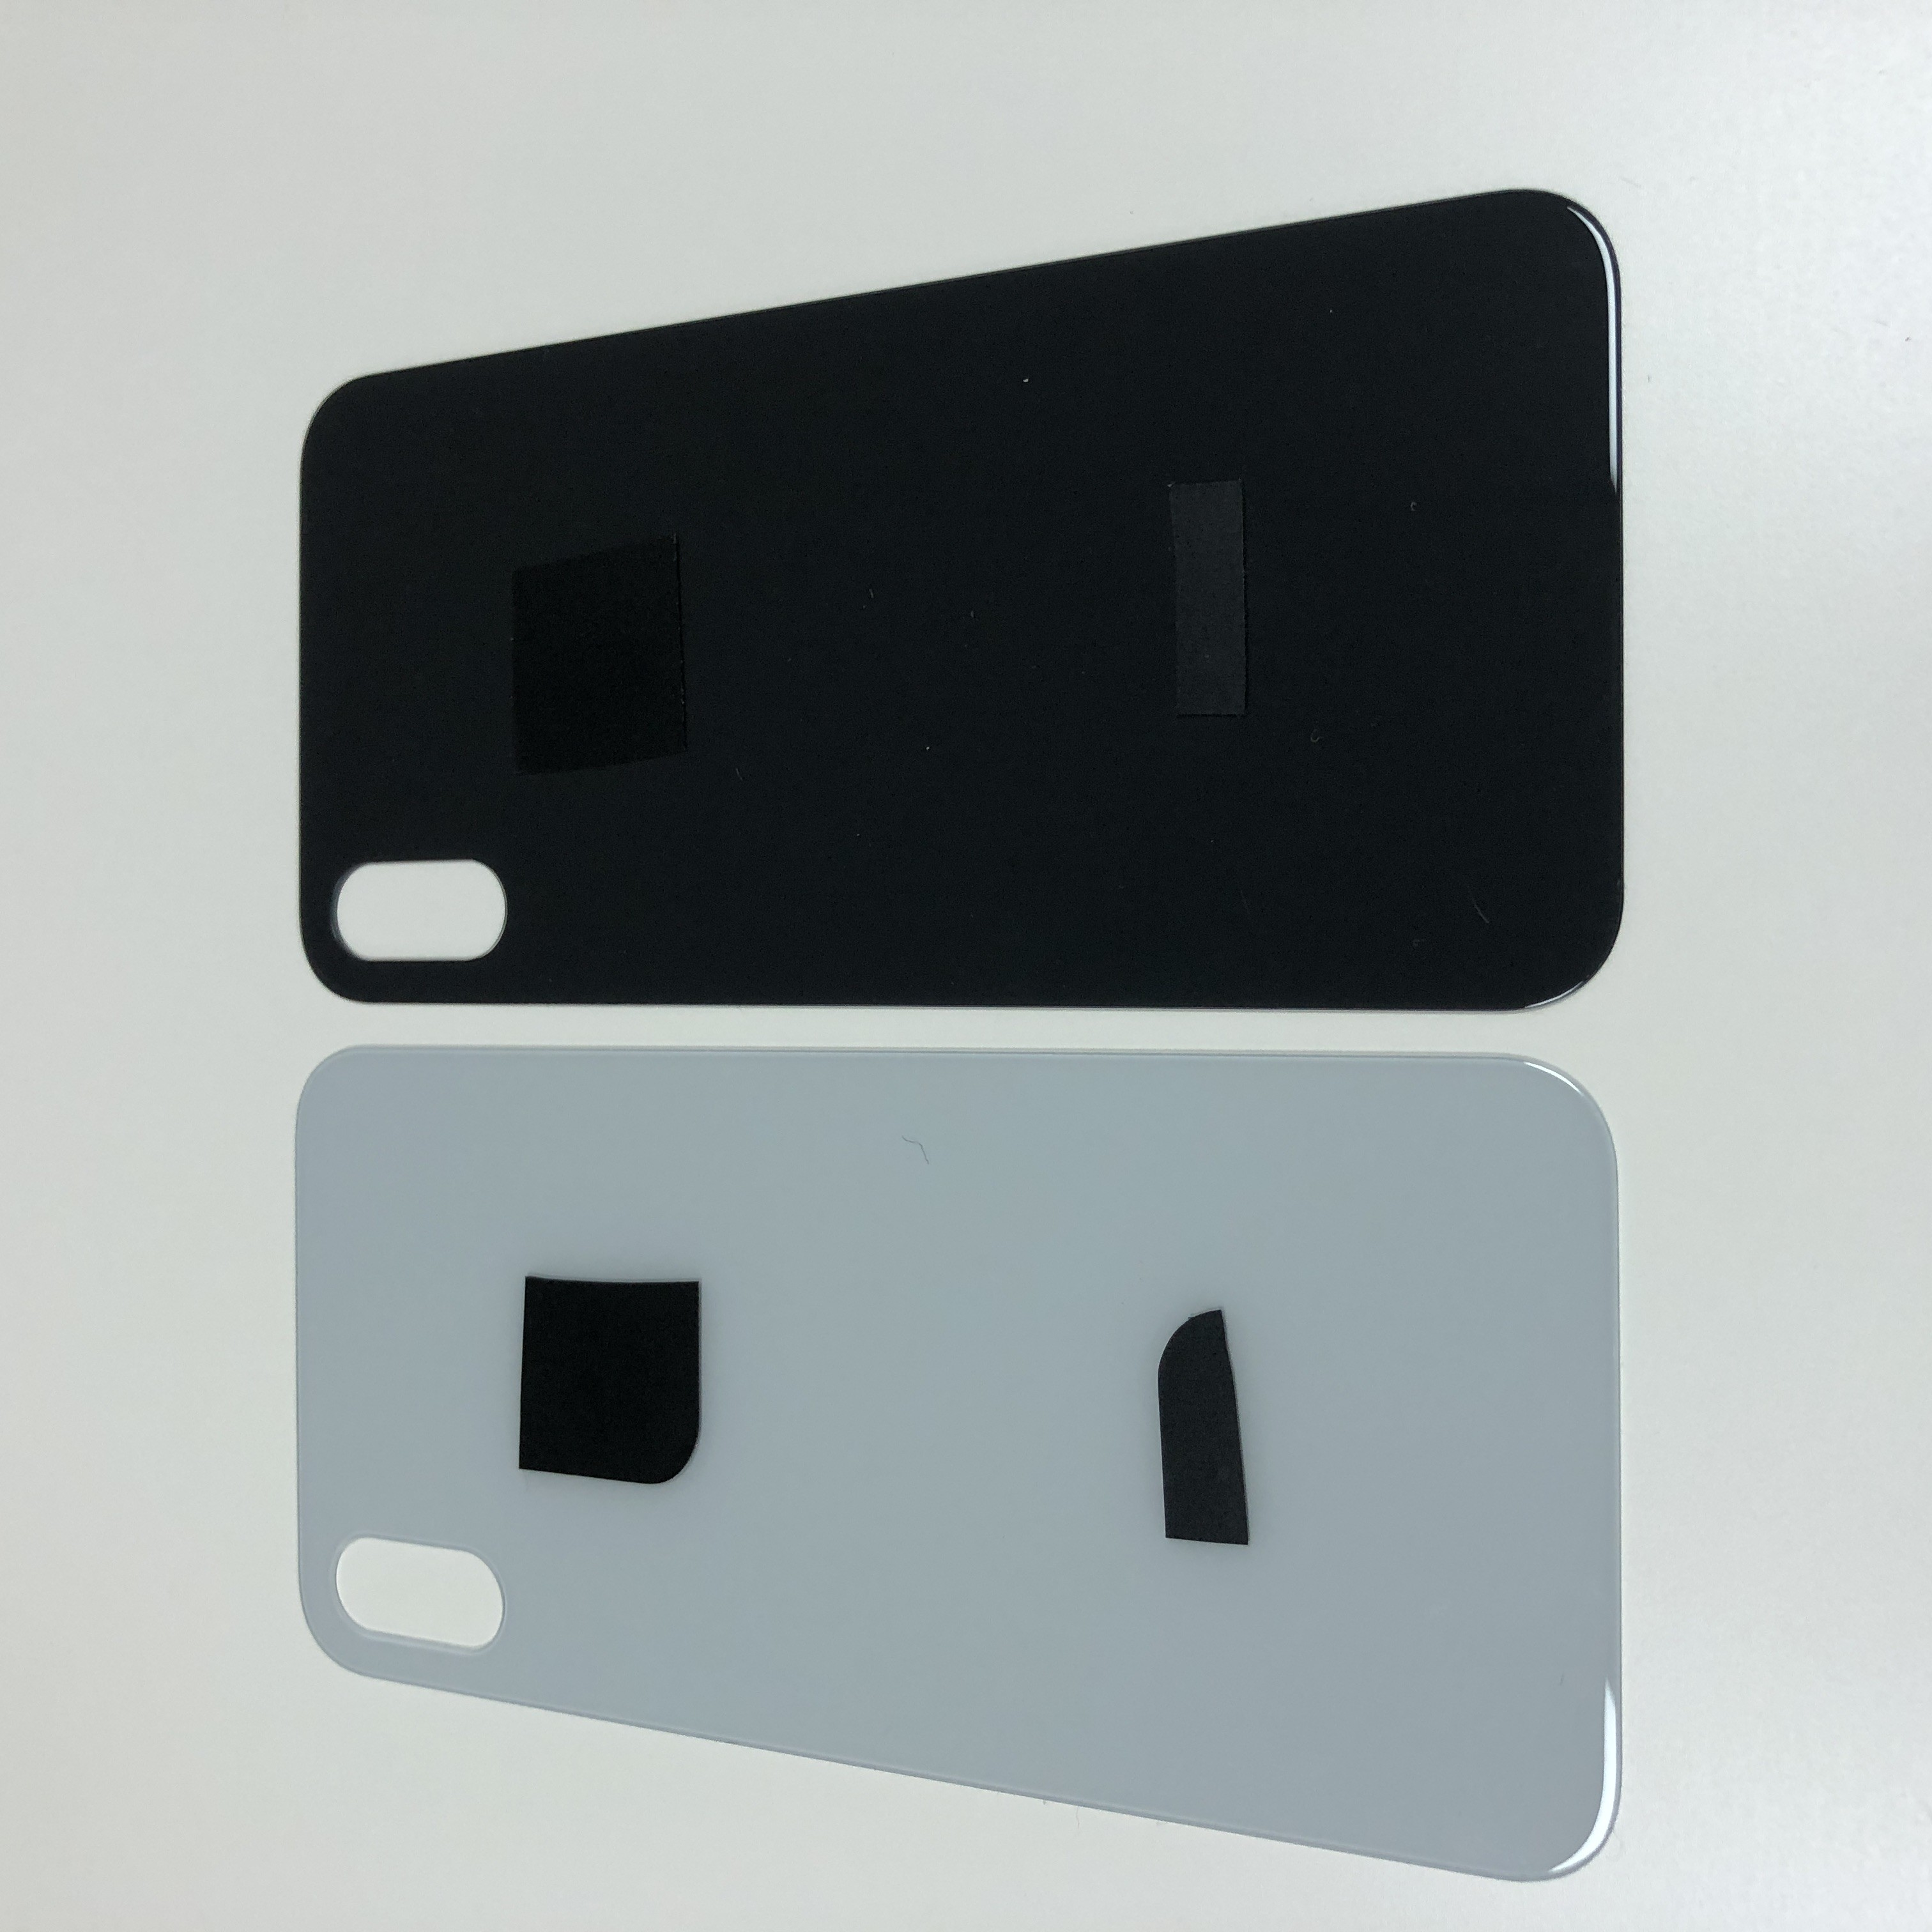 Glas-Rückseite passend für das iPhone X Backcover